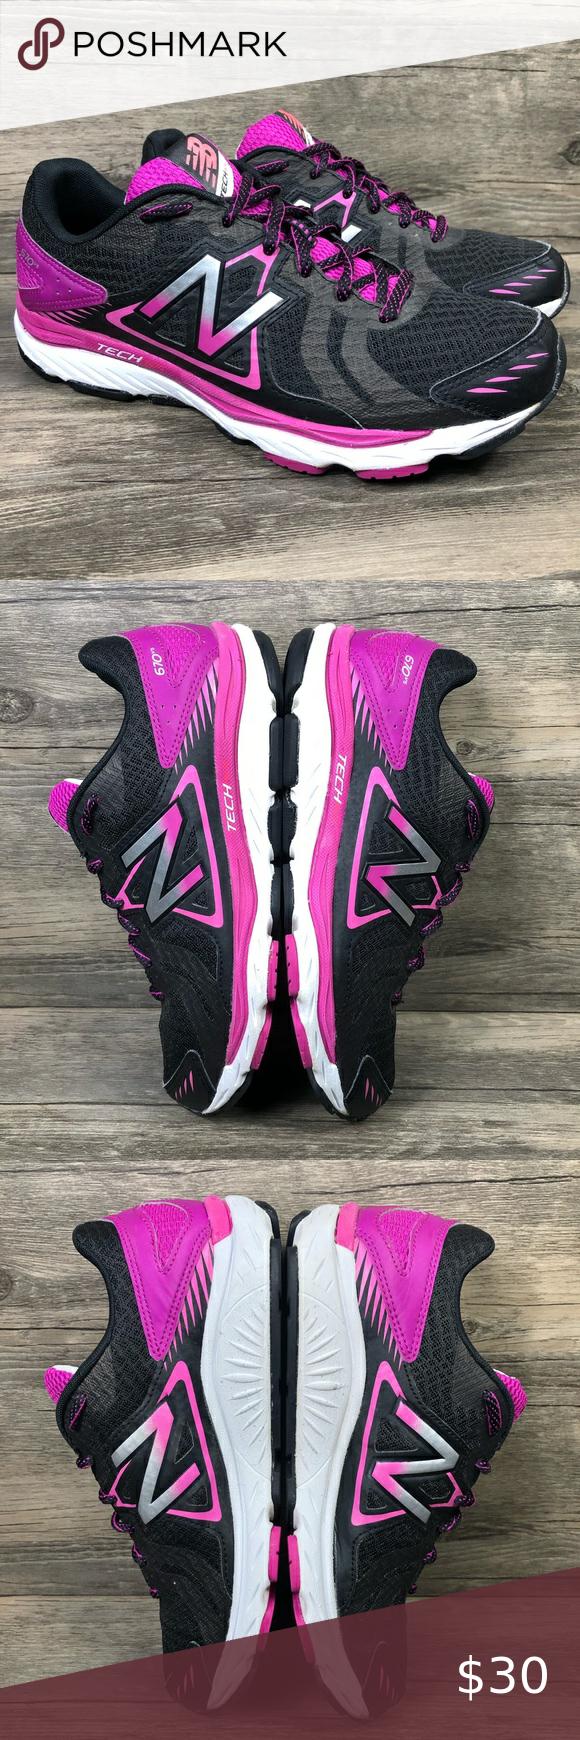 New Balance Tech Ride Black 670 v5 Running Shoes | Running shoes ...